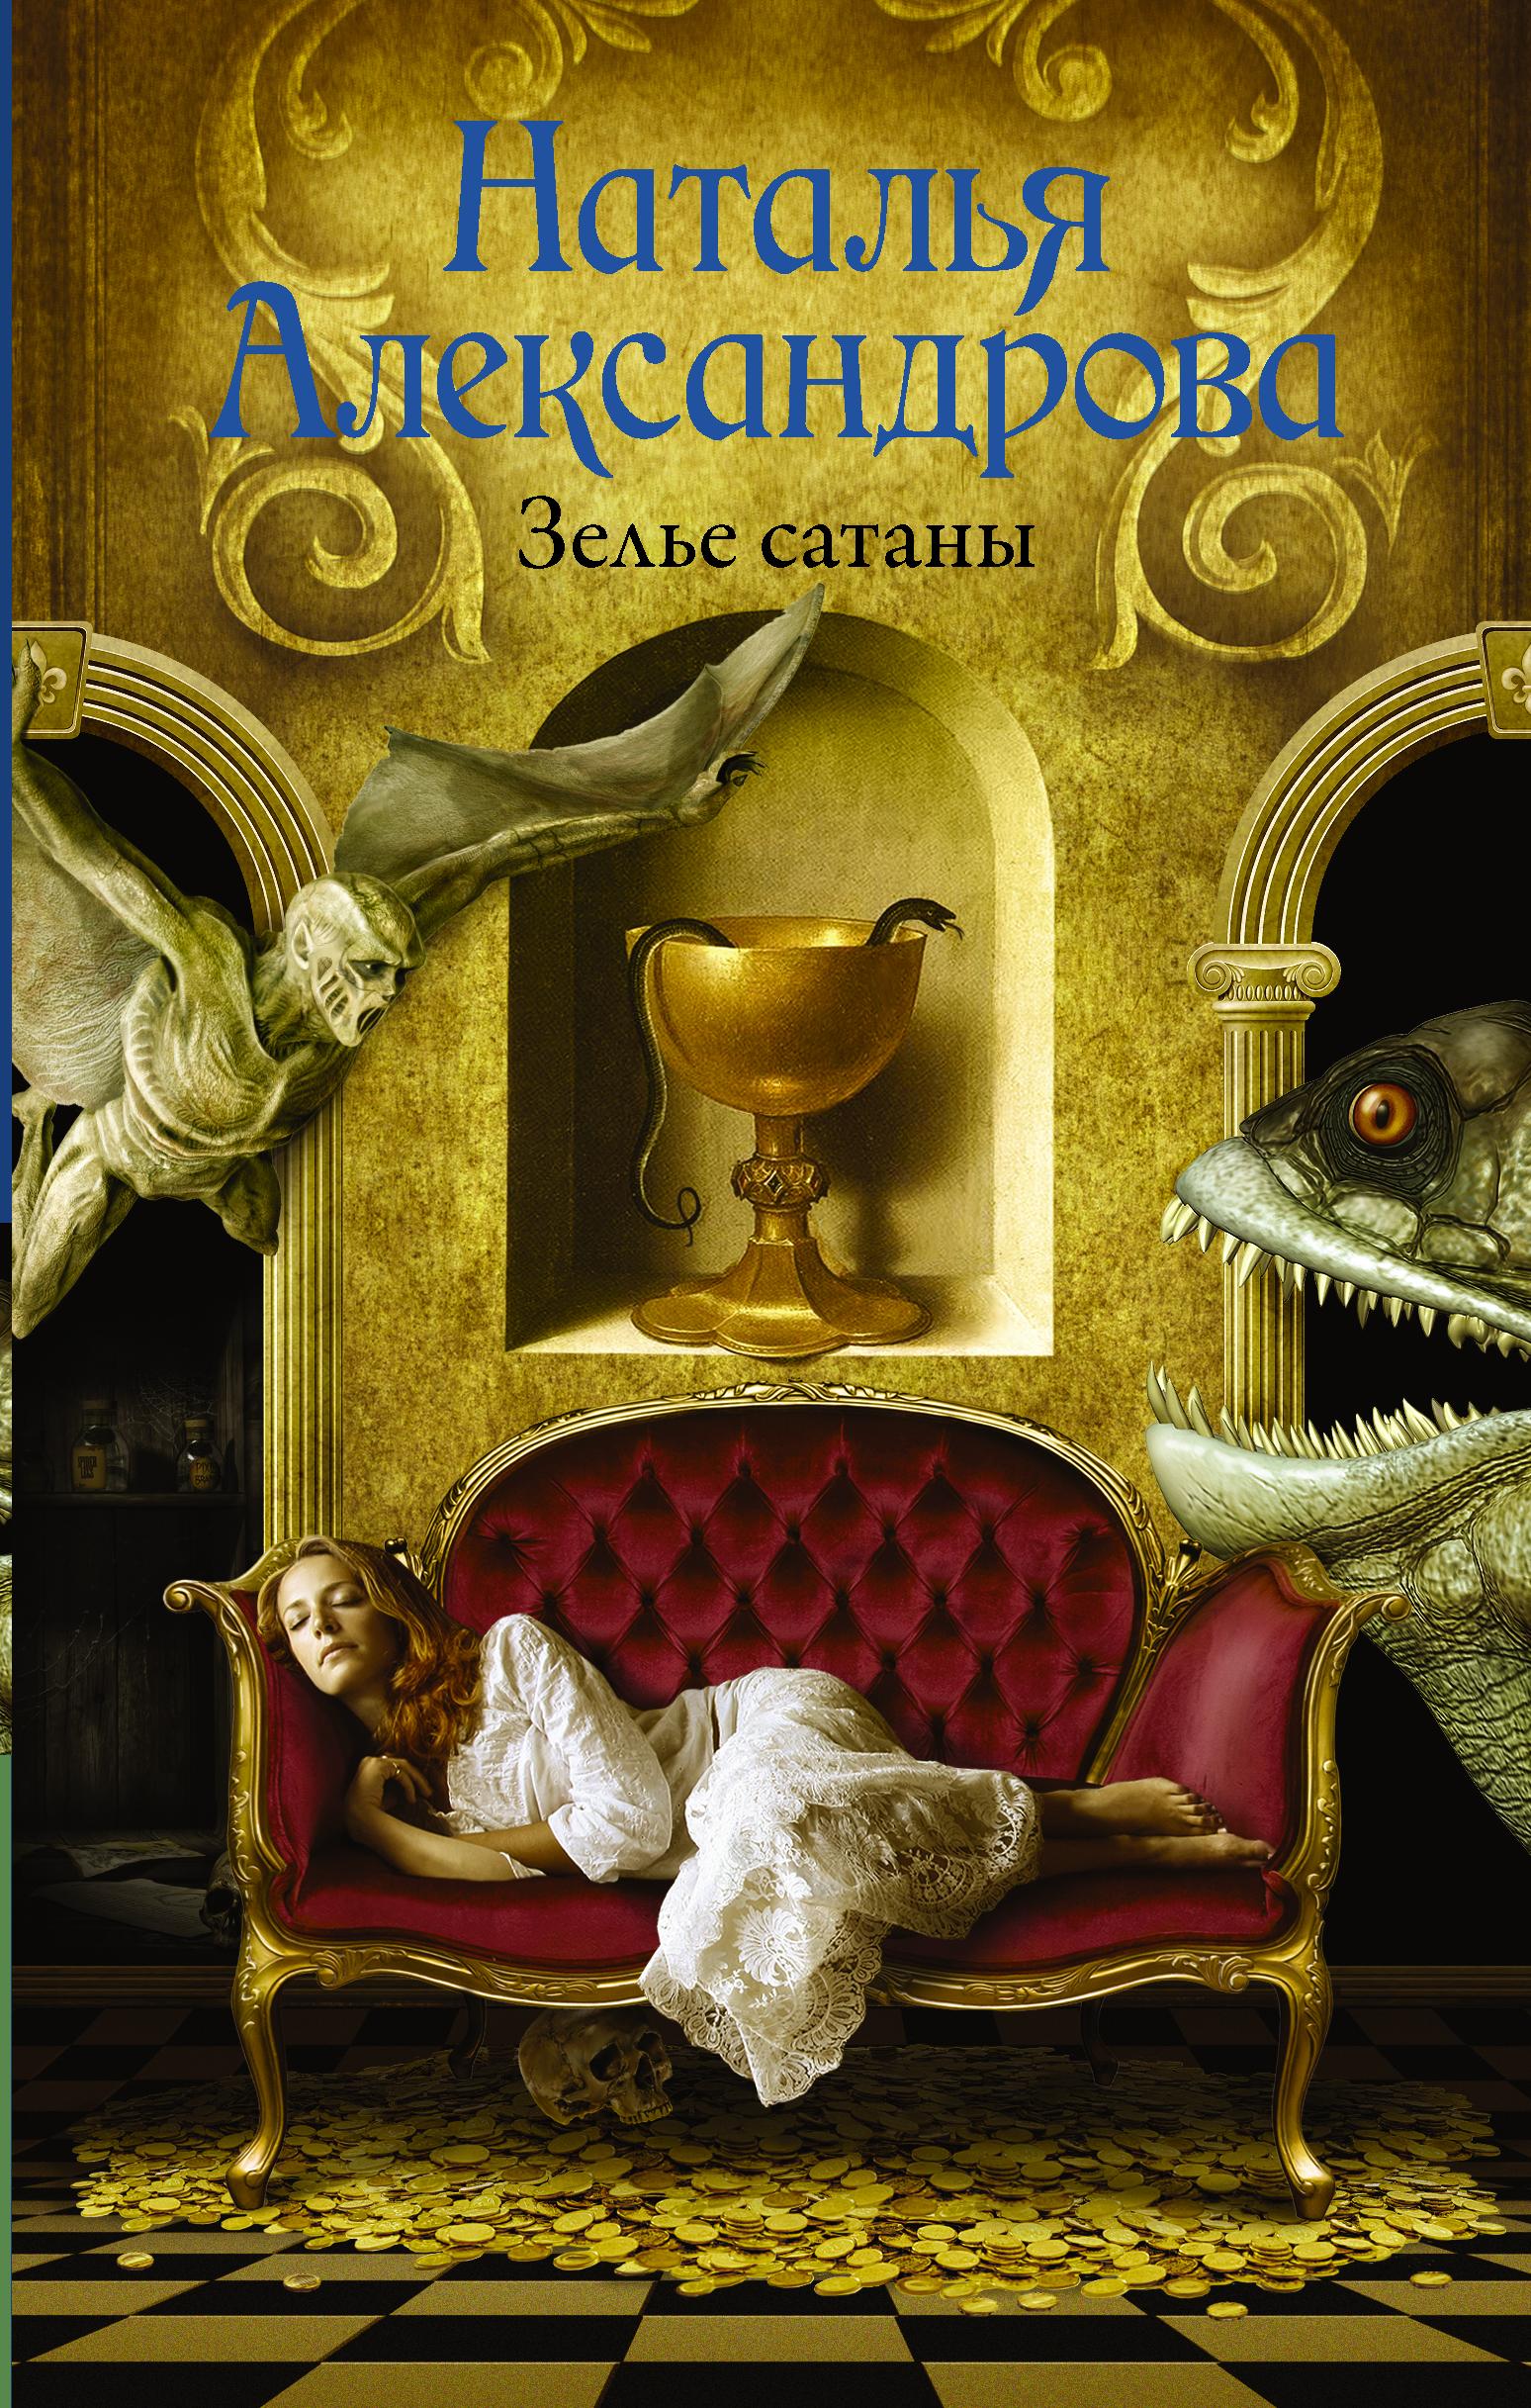 Зелье сатаны ( Александрова Наталья  )